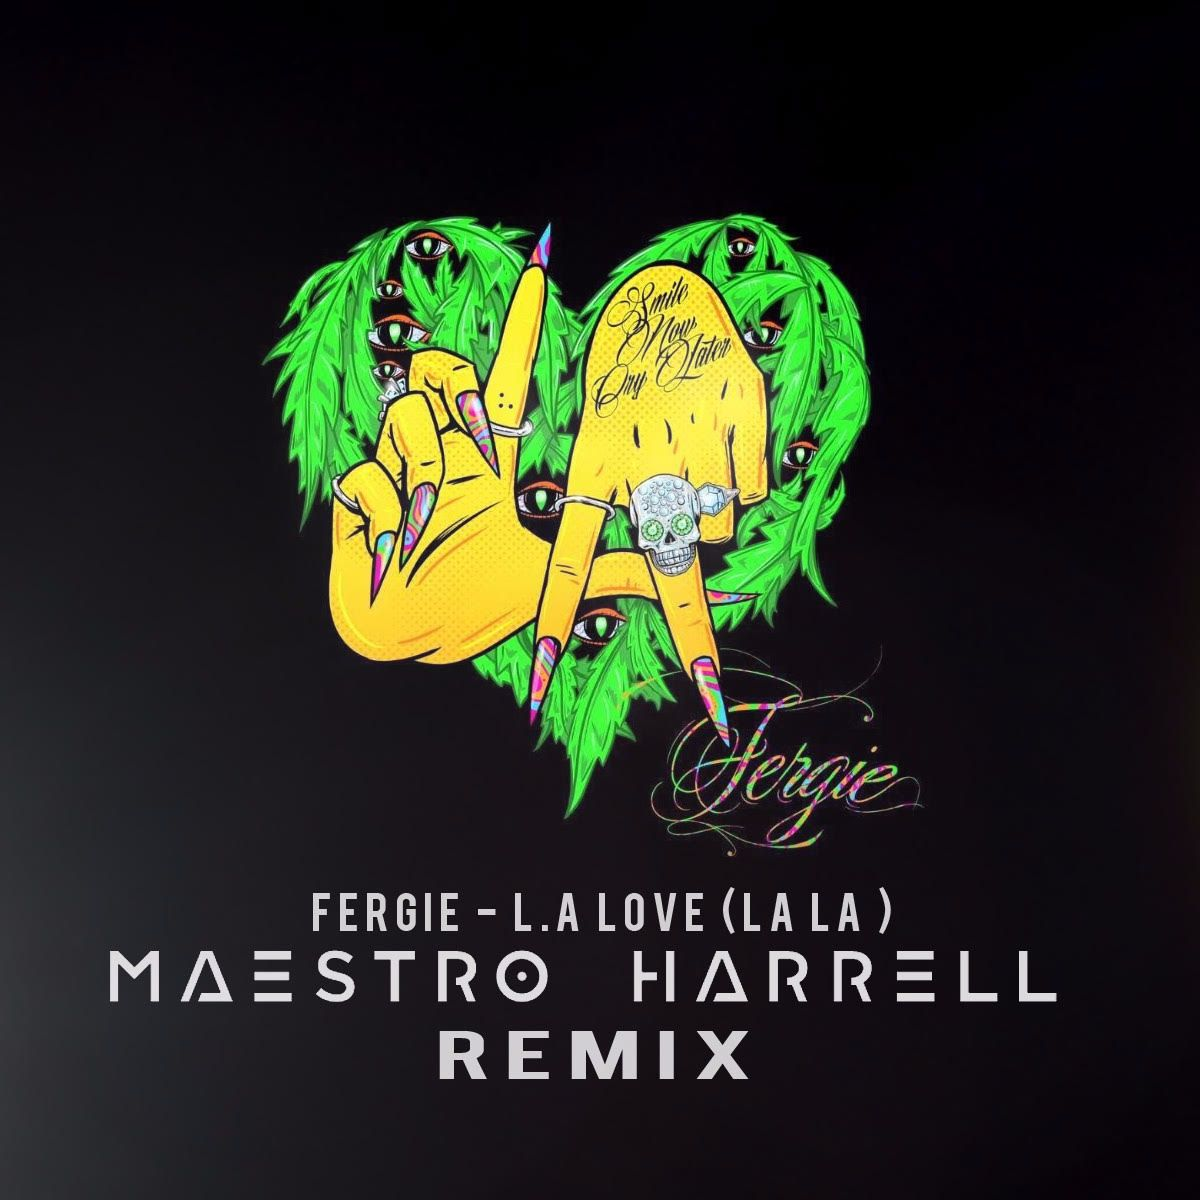 fergie maestro remix